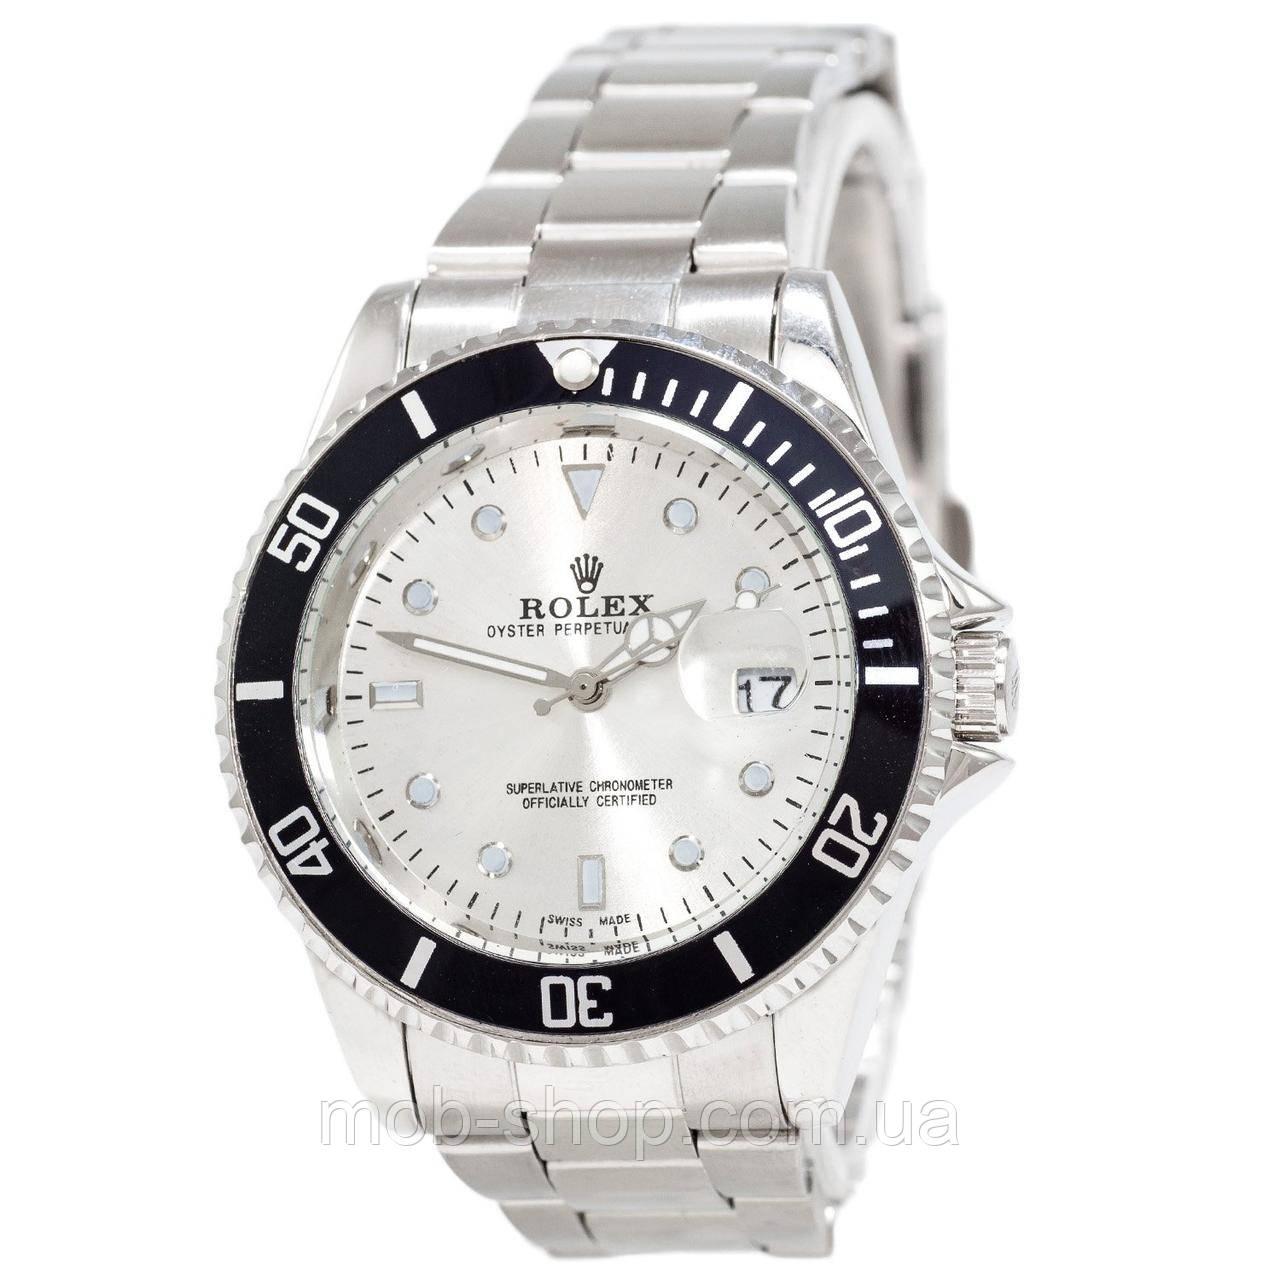 Rolex Submariner 2128 Quarts Silver-Black-Silver